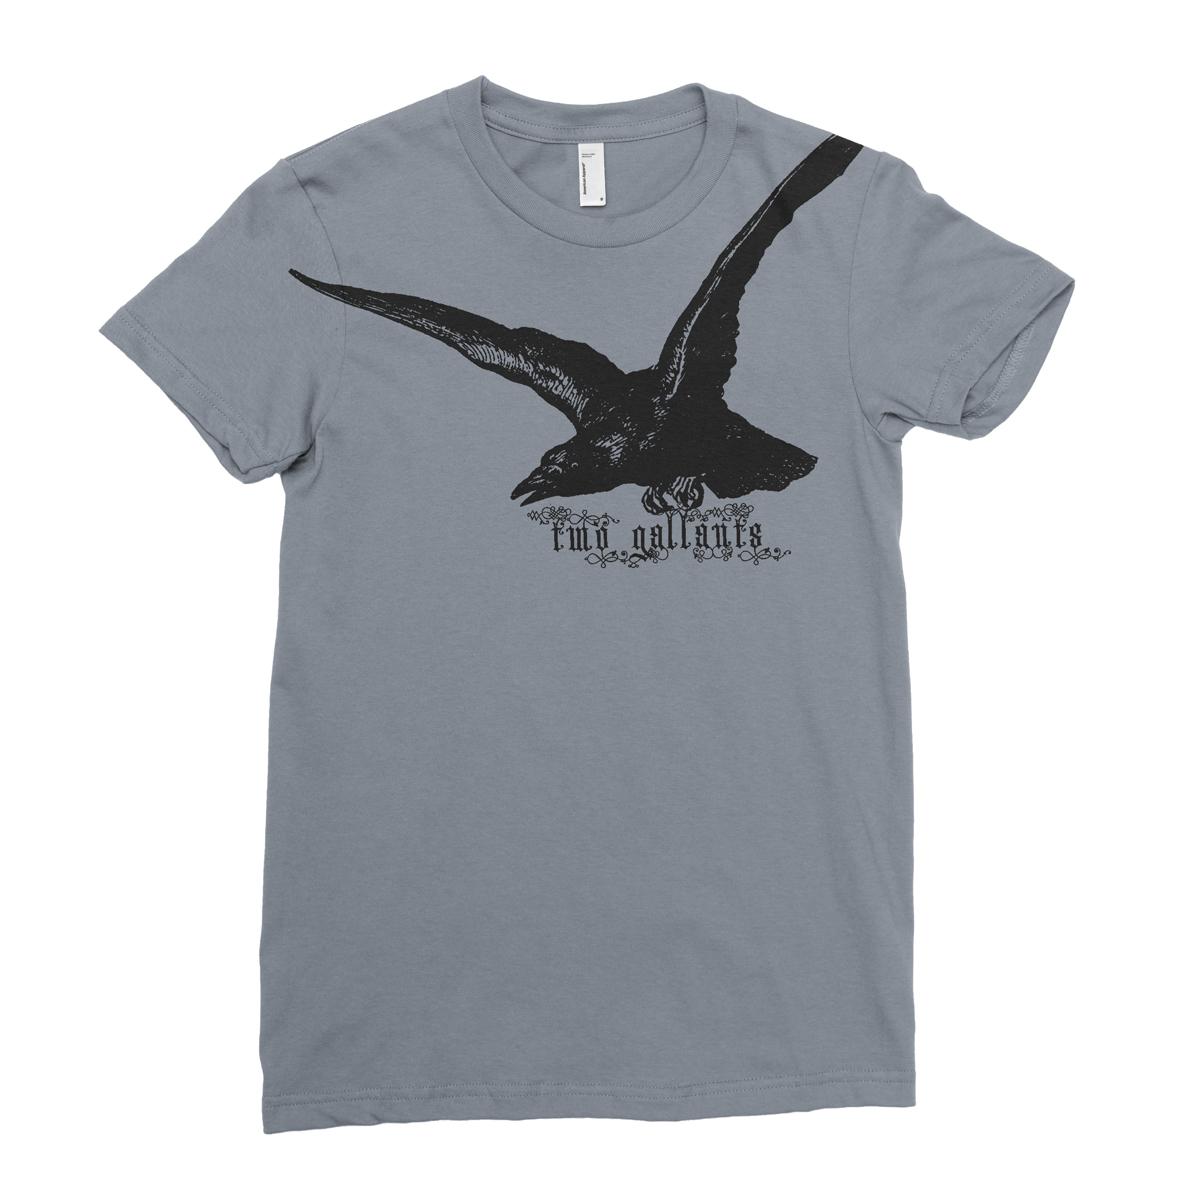 Raven Tee - Asphalt - Two Gallants